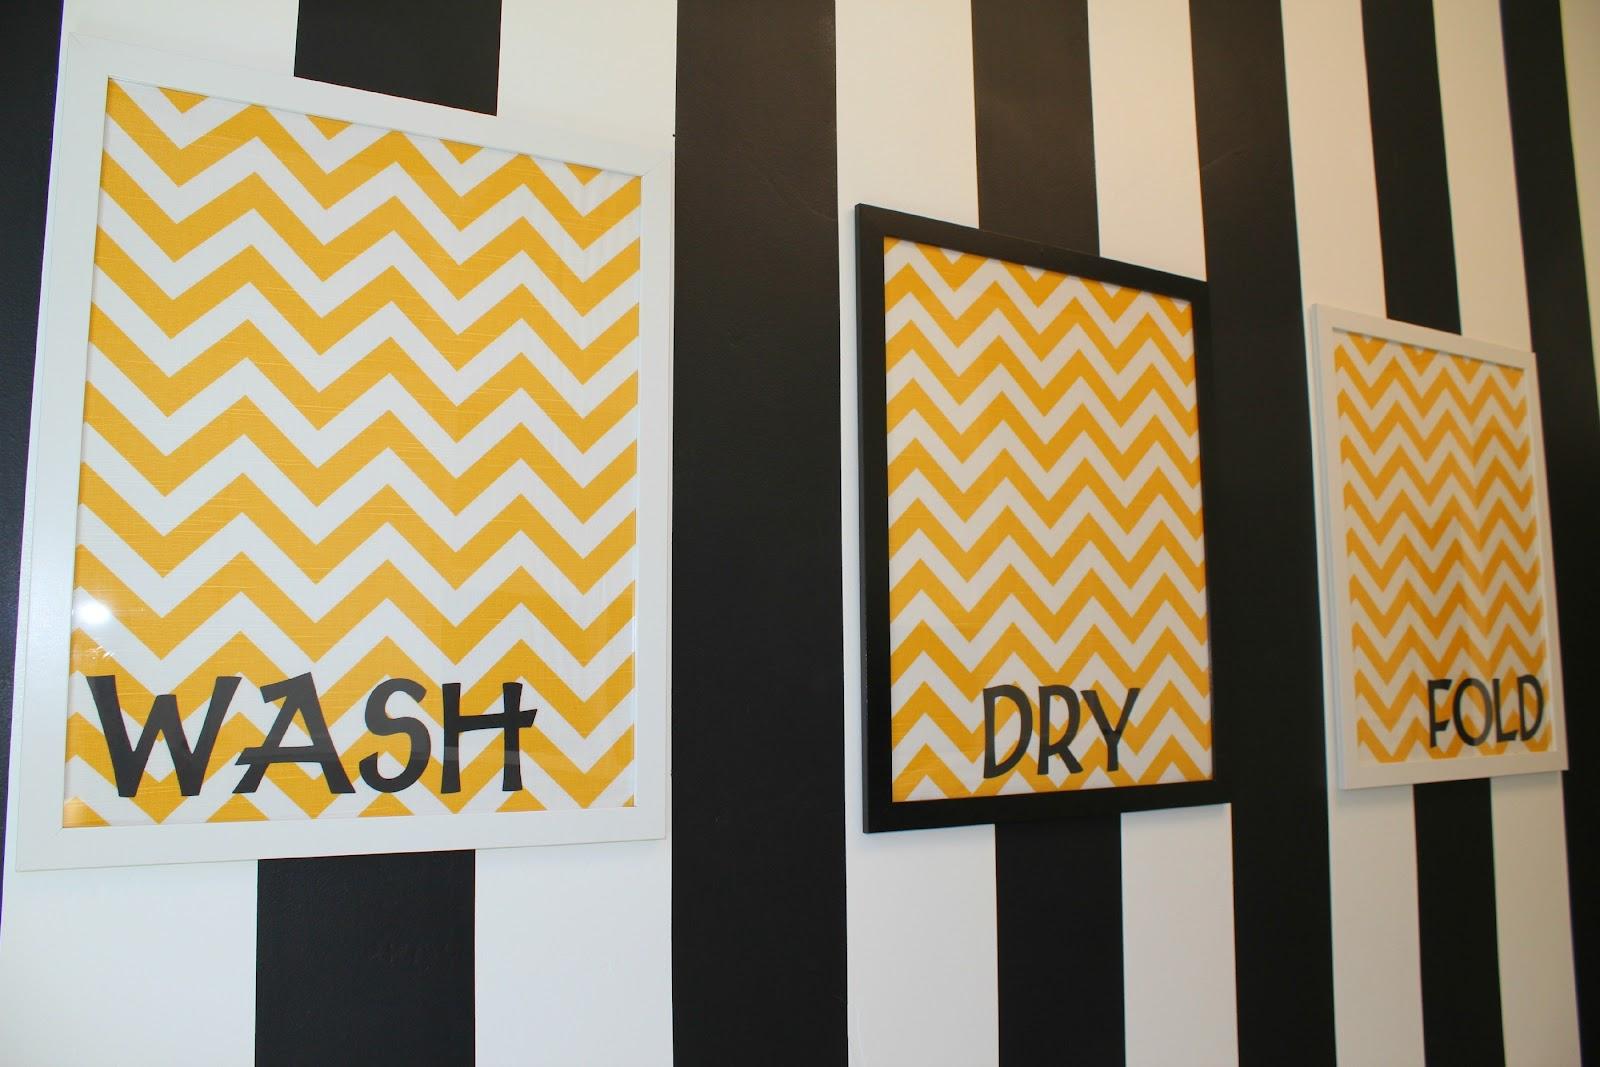 Wood and Cloth: Cloth - Easy Chevron Laundry Wall Art